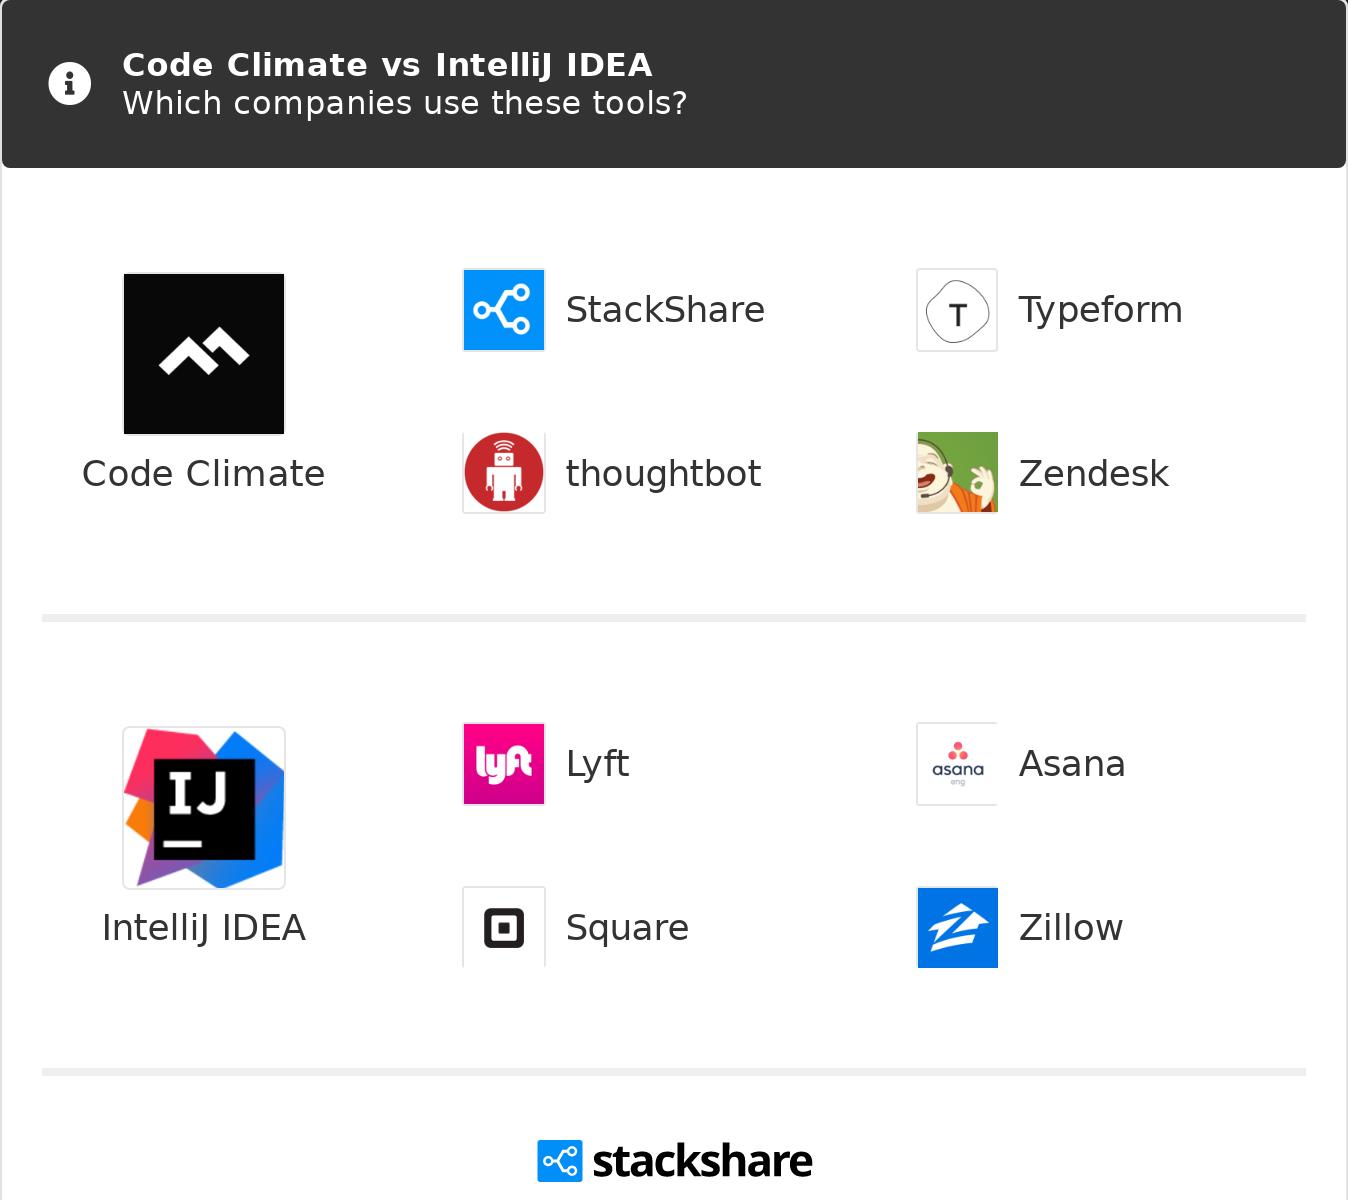 Code Climate vs IntelliJ IDEA | What are the differences?